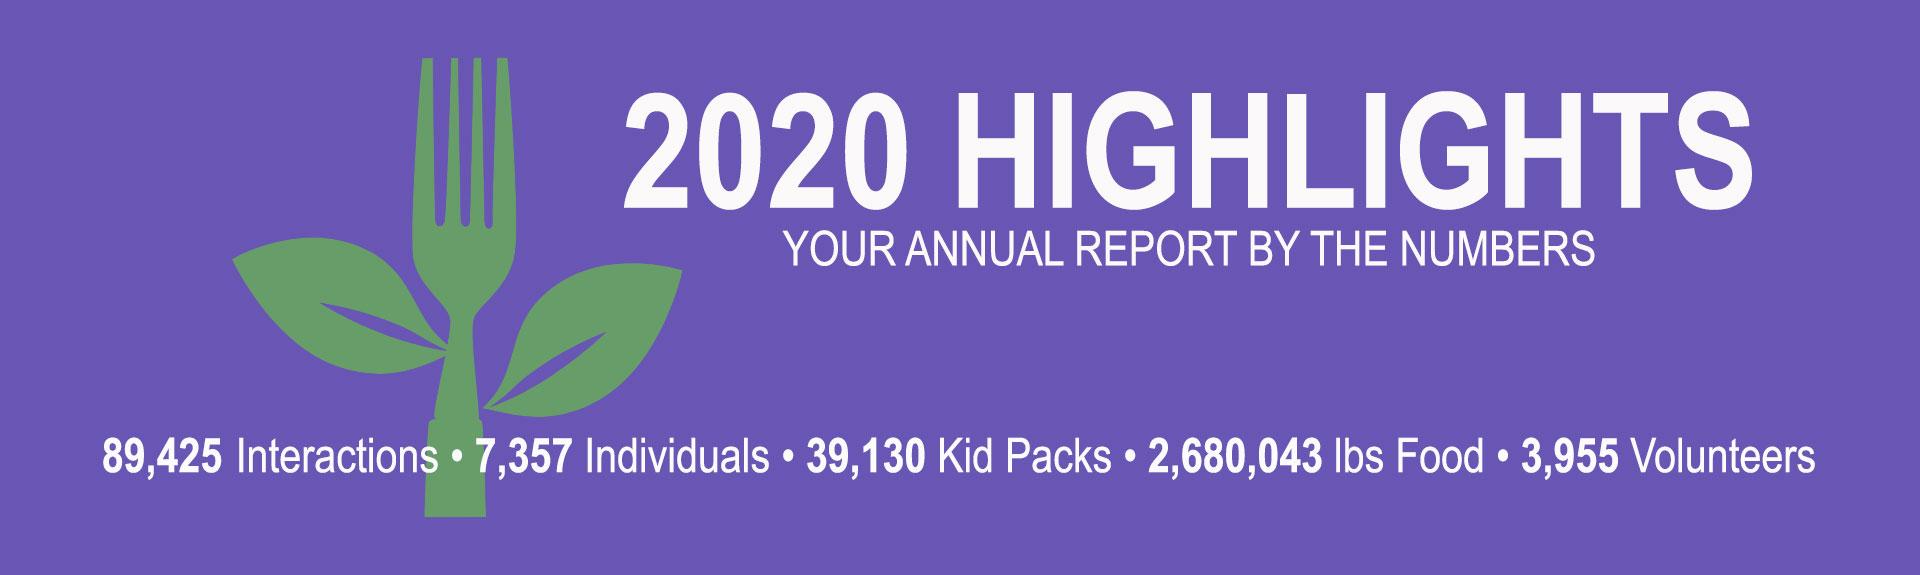 2020 Highlights Web Banner